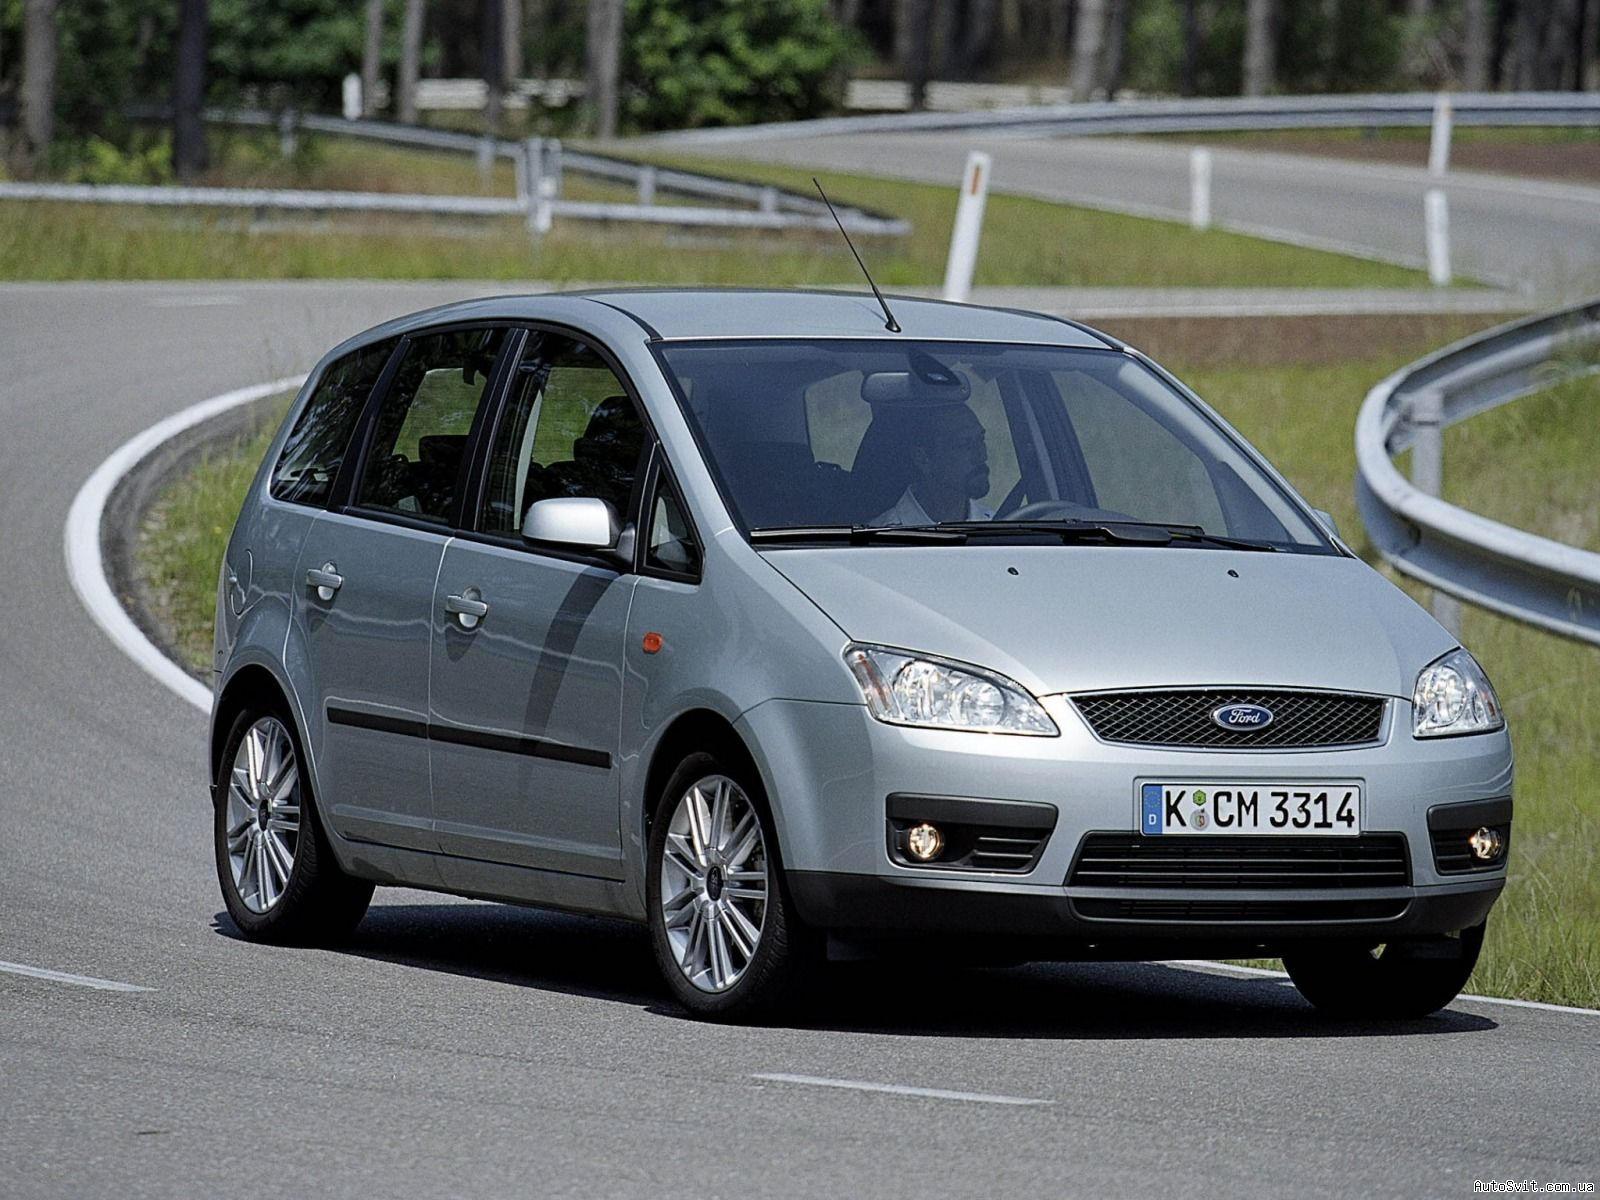 Ford C-max 2005 foto - 5